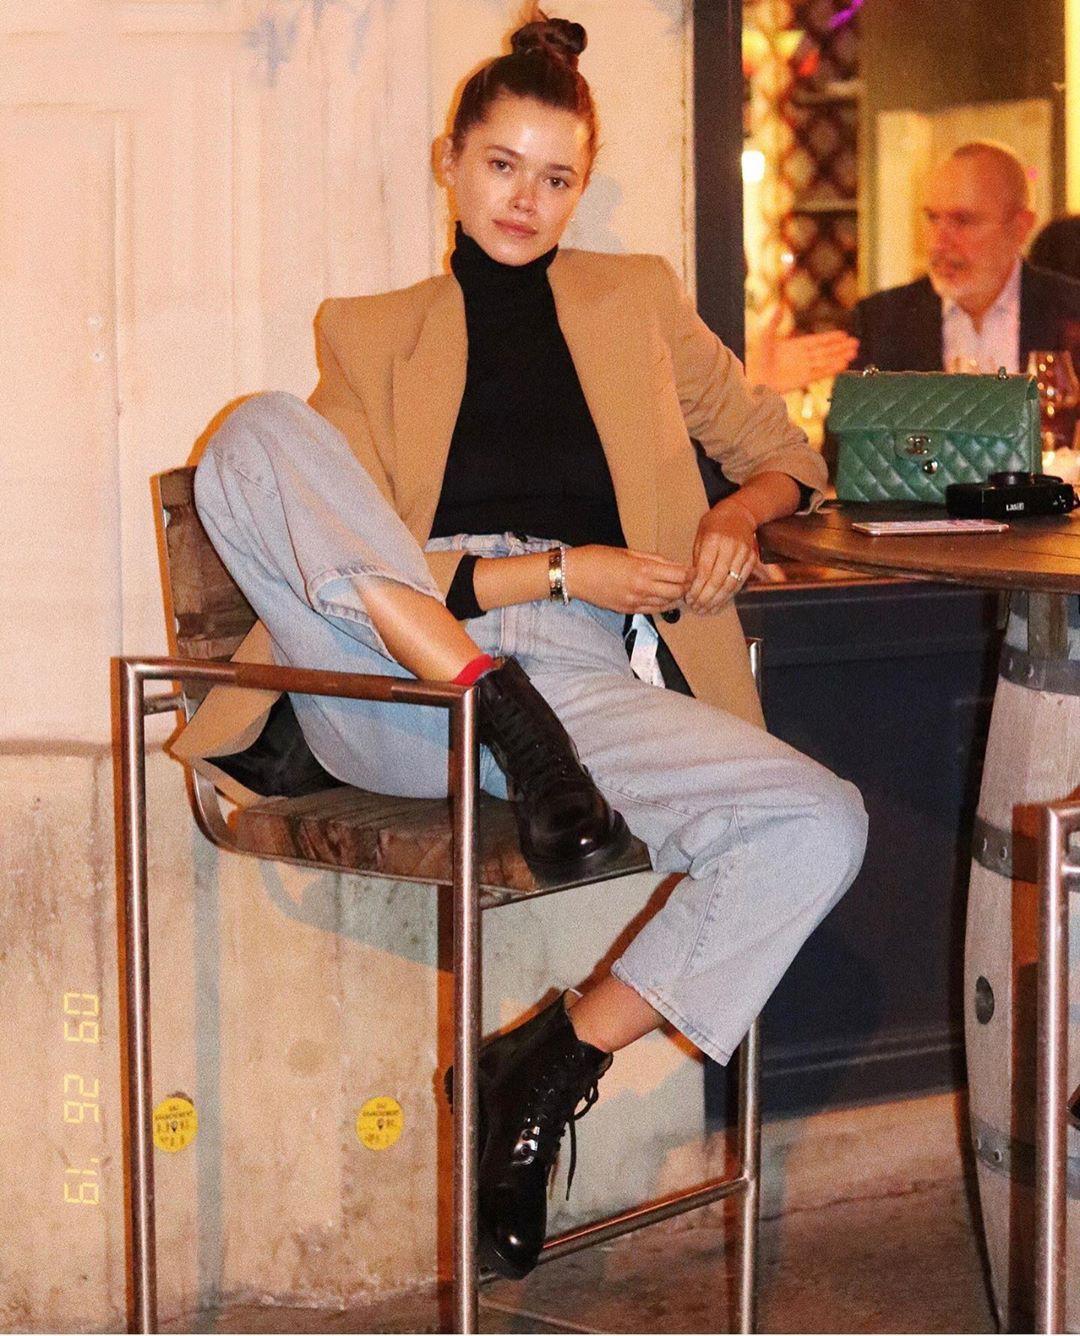 Women Blazer Outfits, Valeria Lipovetsky, Street fashion